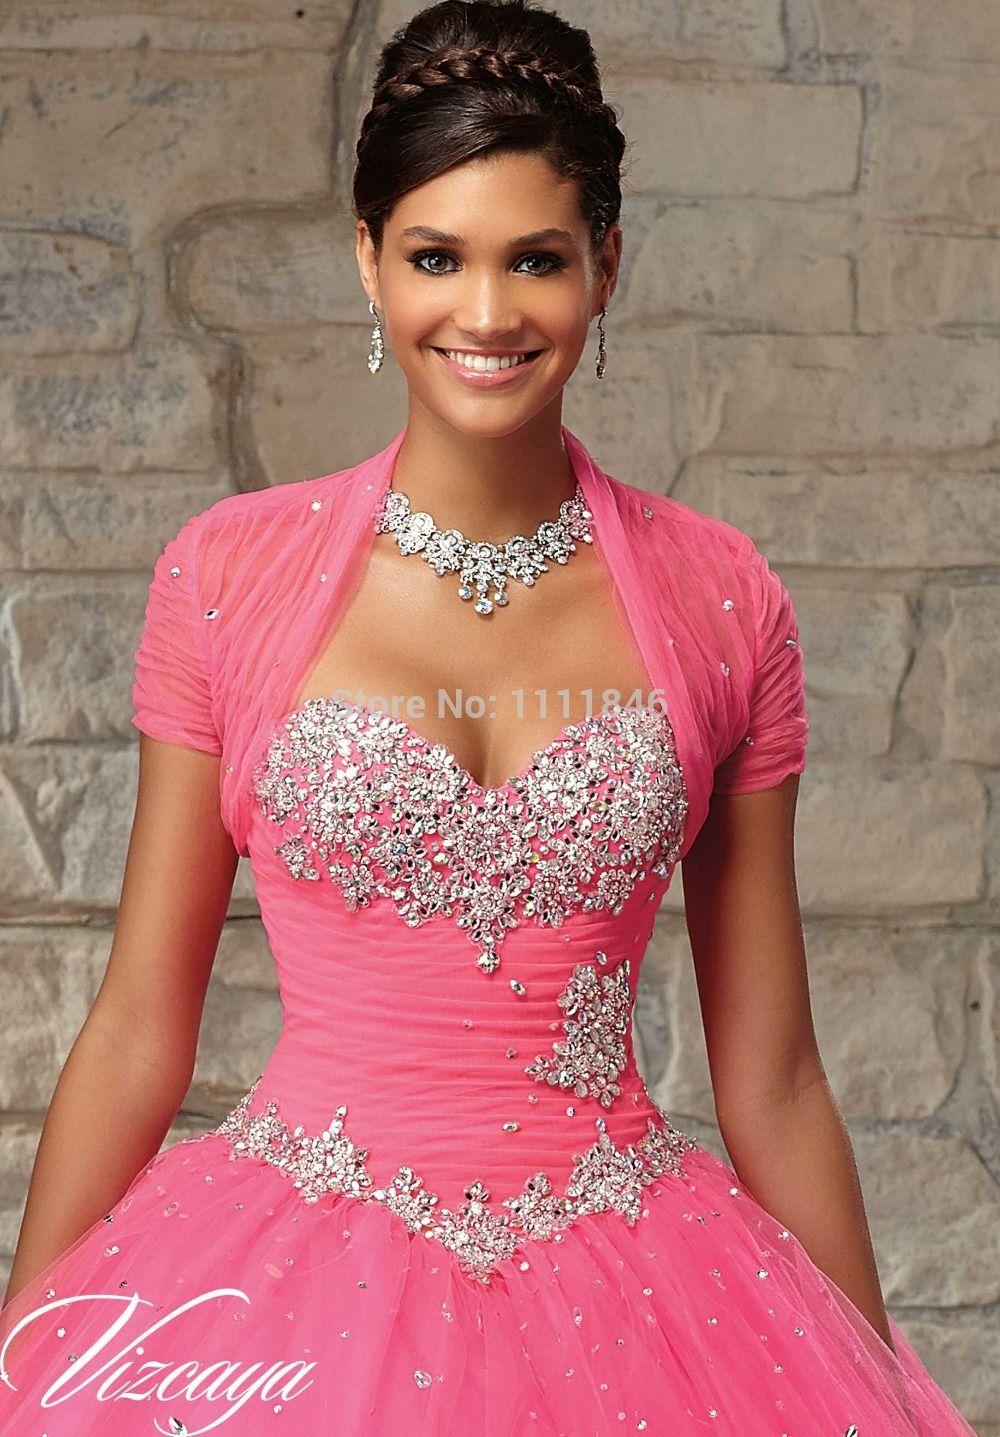 Increíble hermosos cristales acanalada blusa turquesa vestidos ...